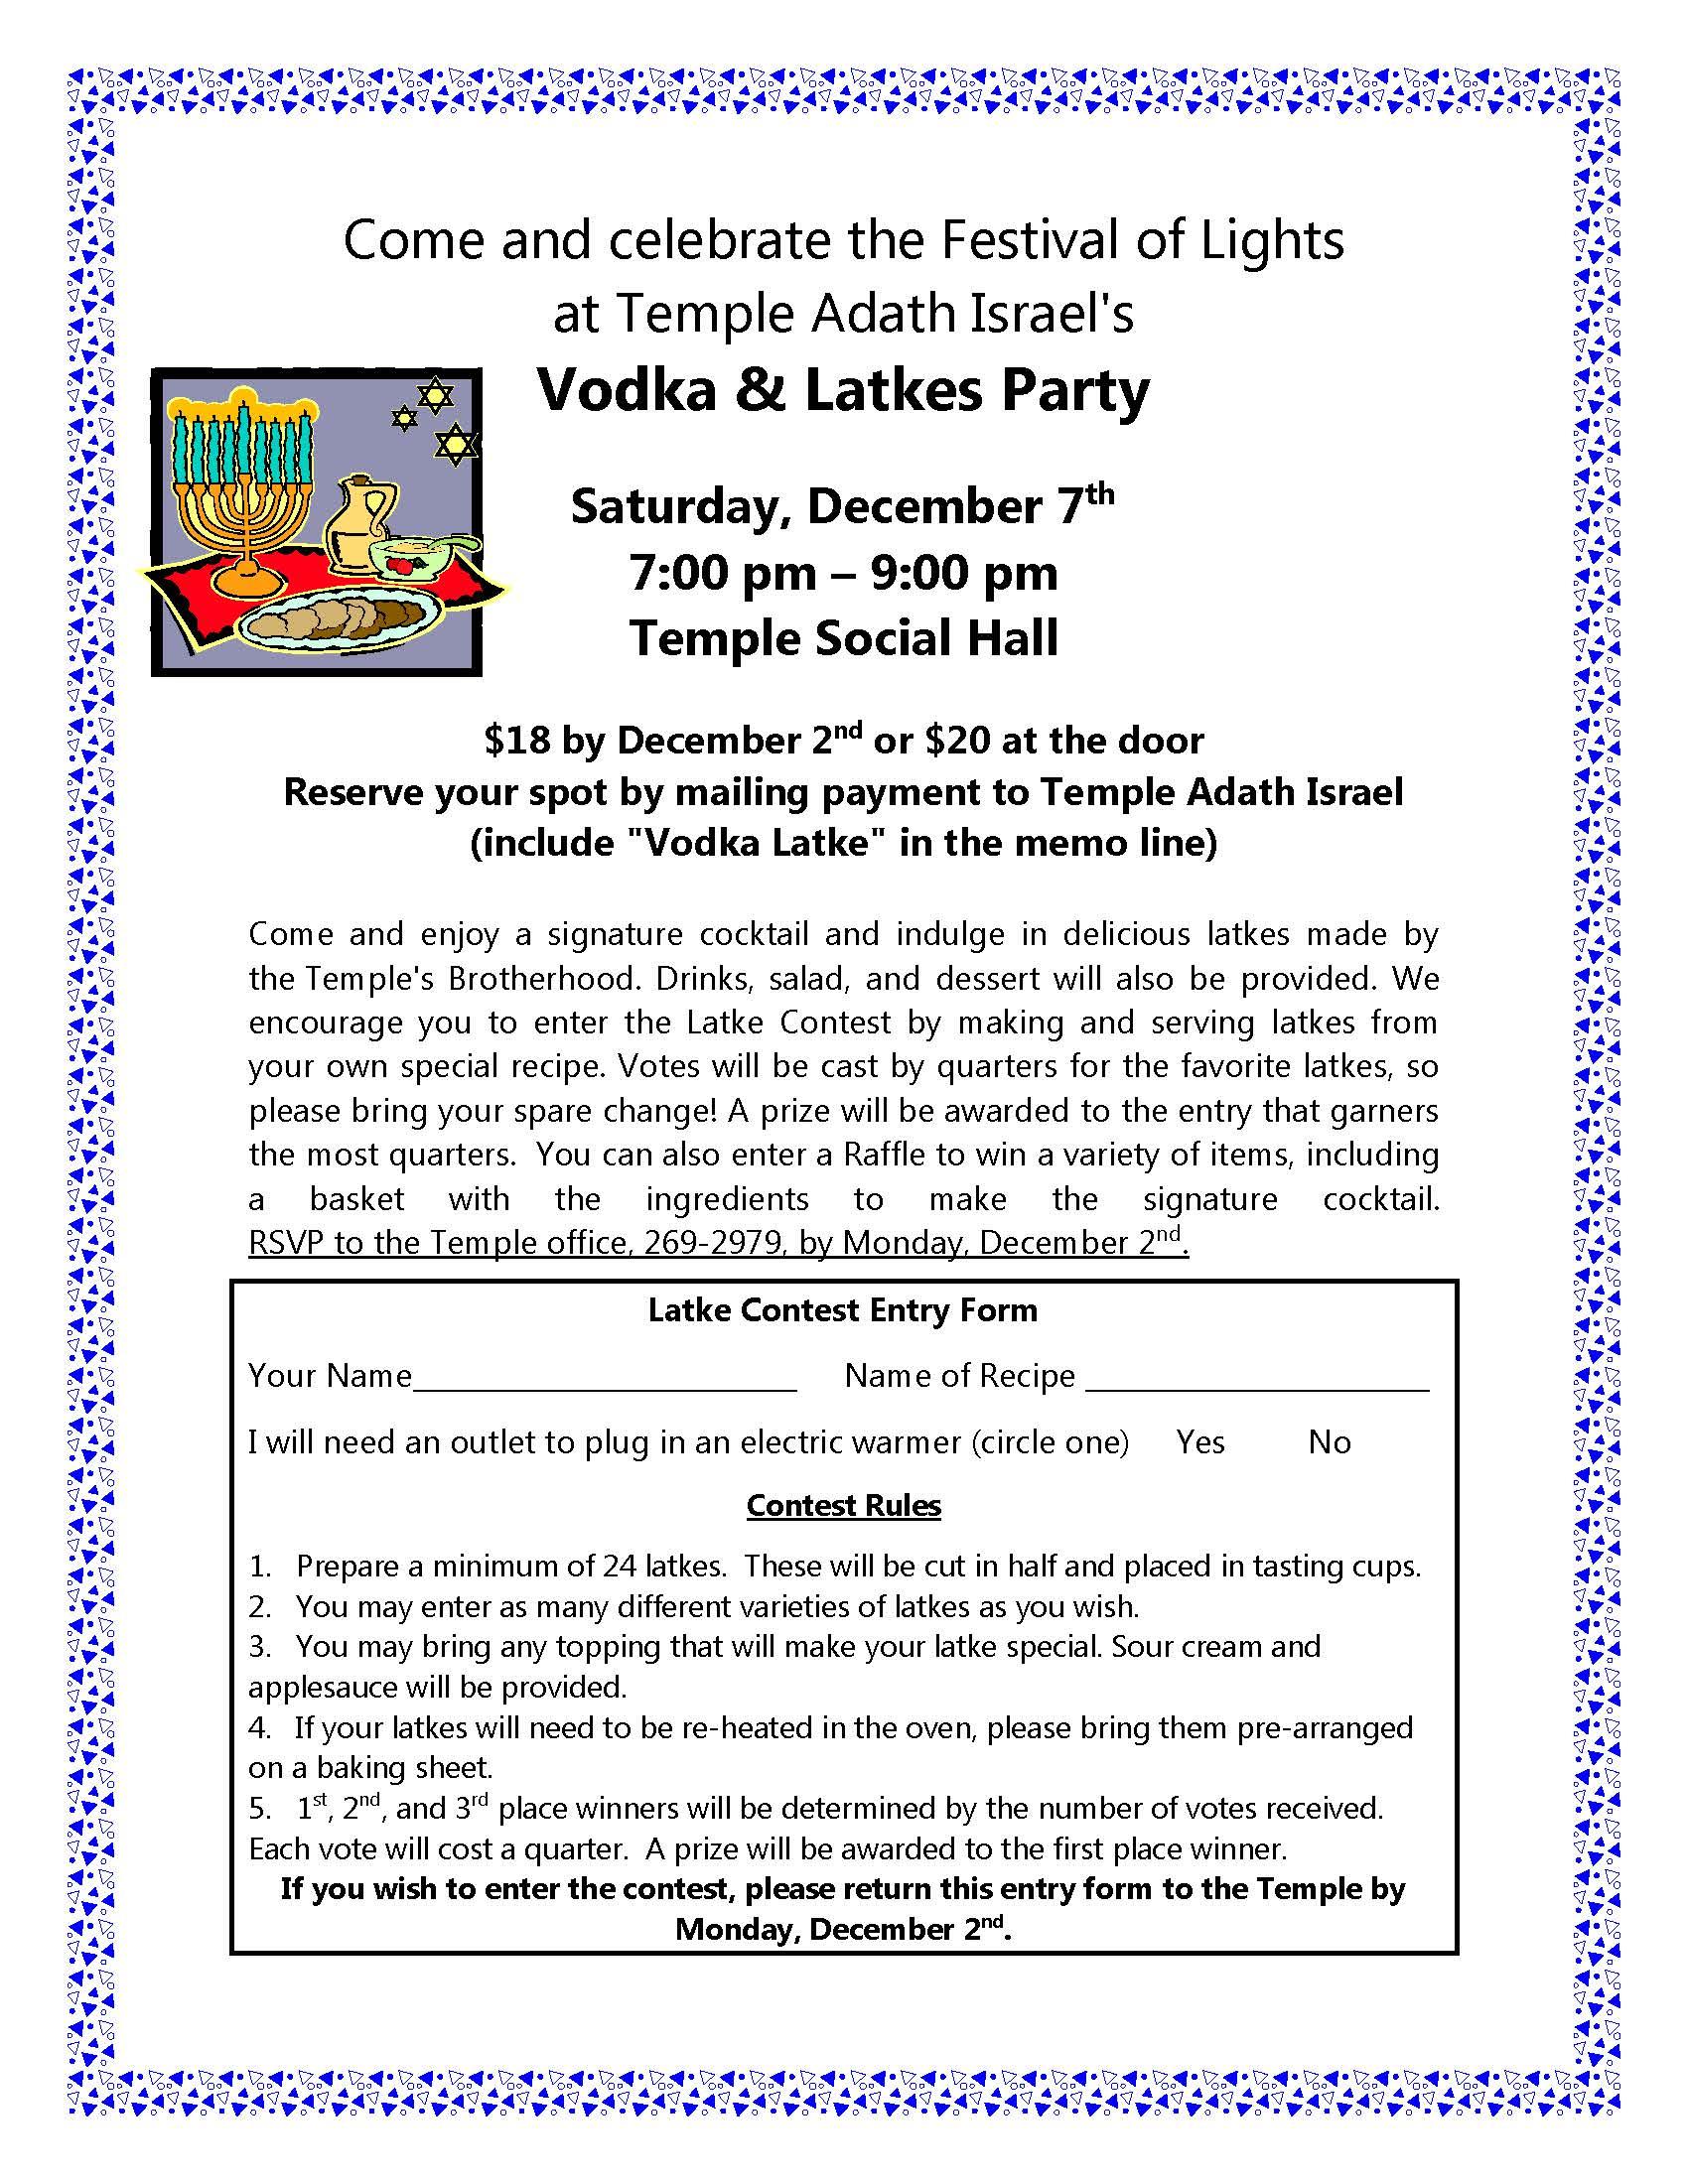 Invite Vodka  Latke Party 2013